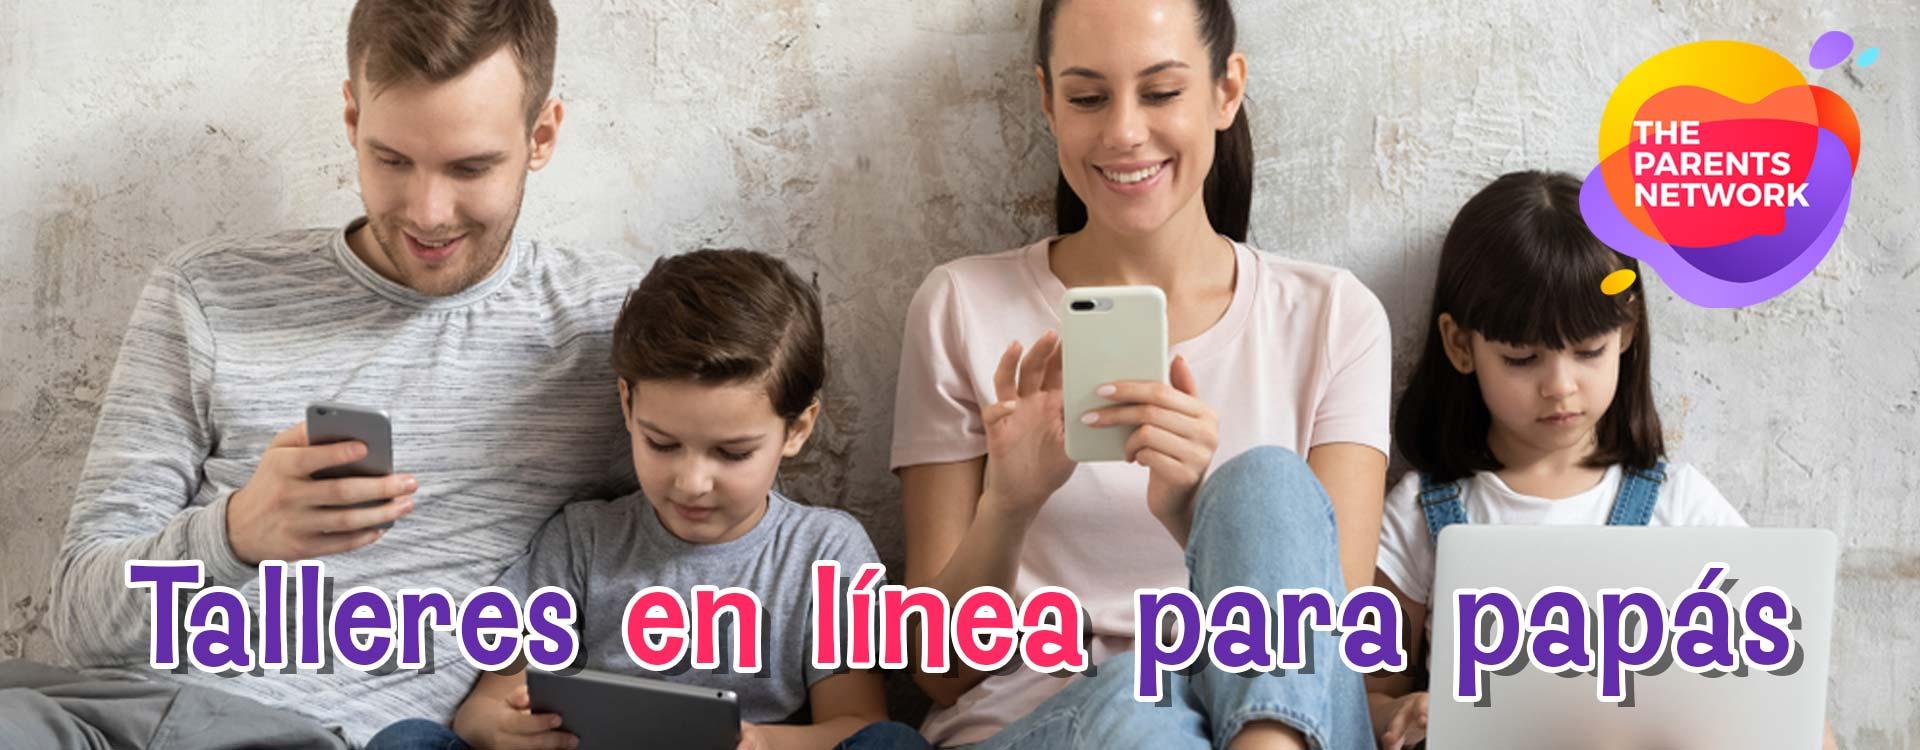 Talleres en linea para papas, uso de la tecnologia, configuracion